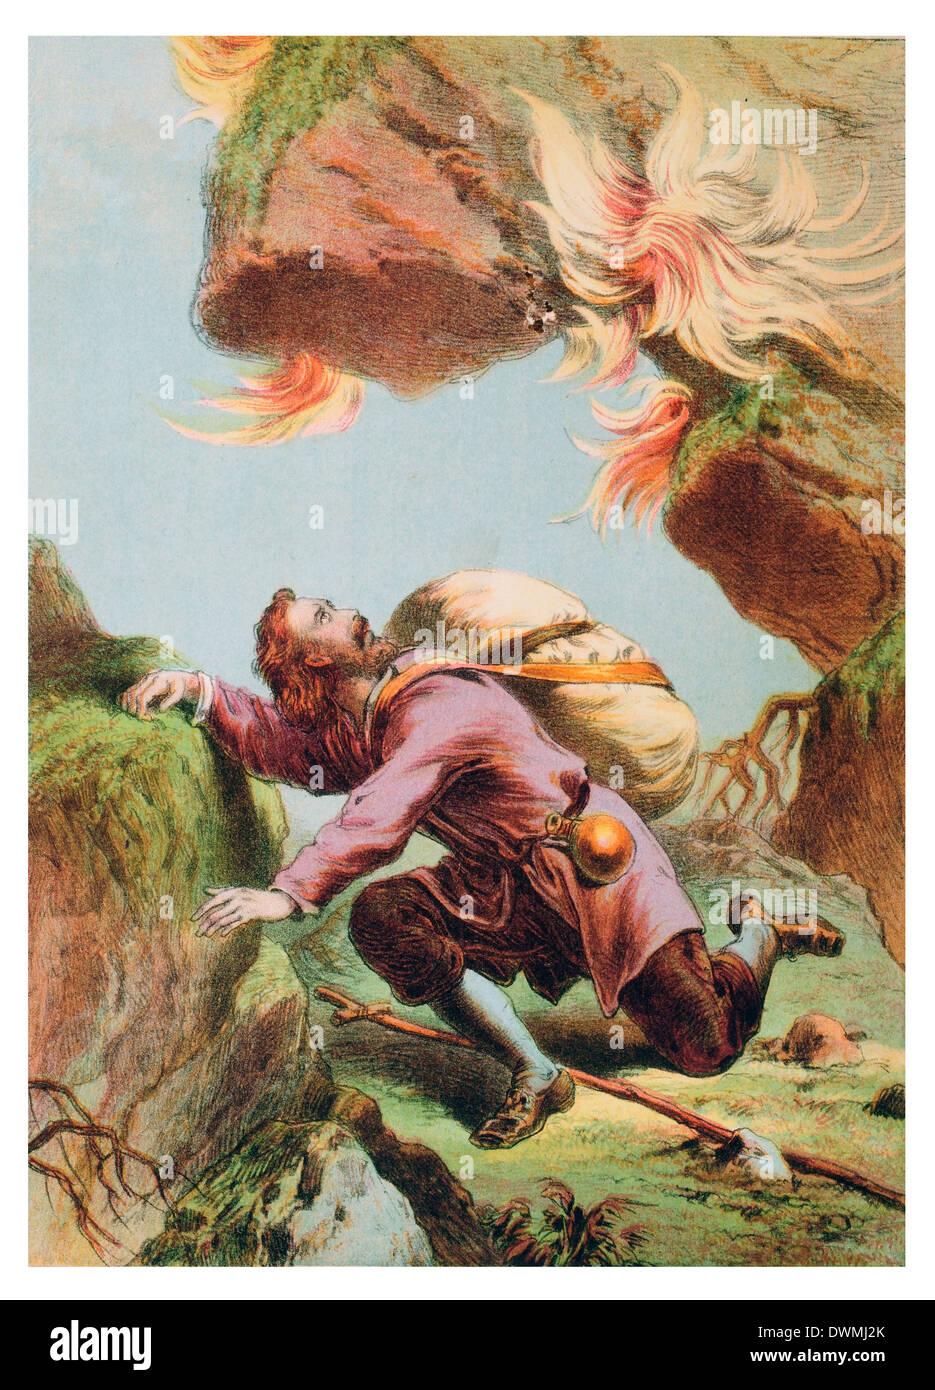 Christian under Mount Sinai - Stock Image